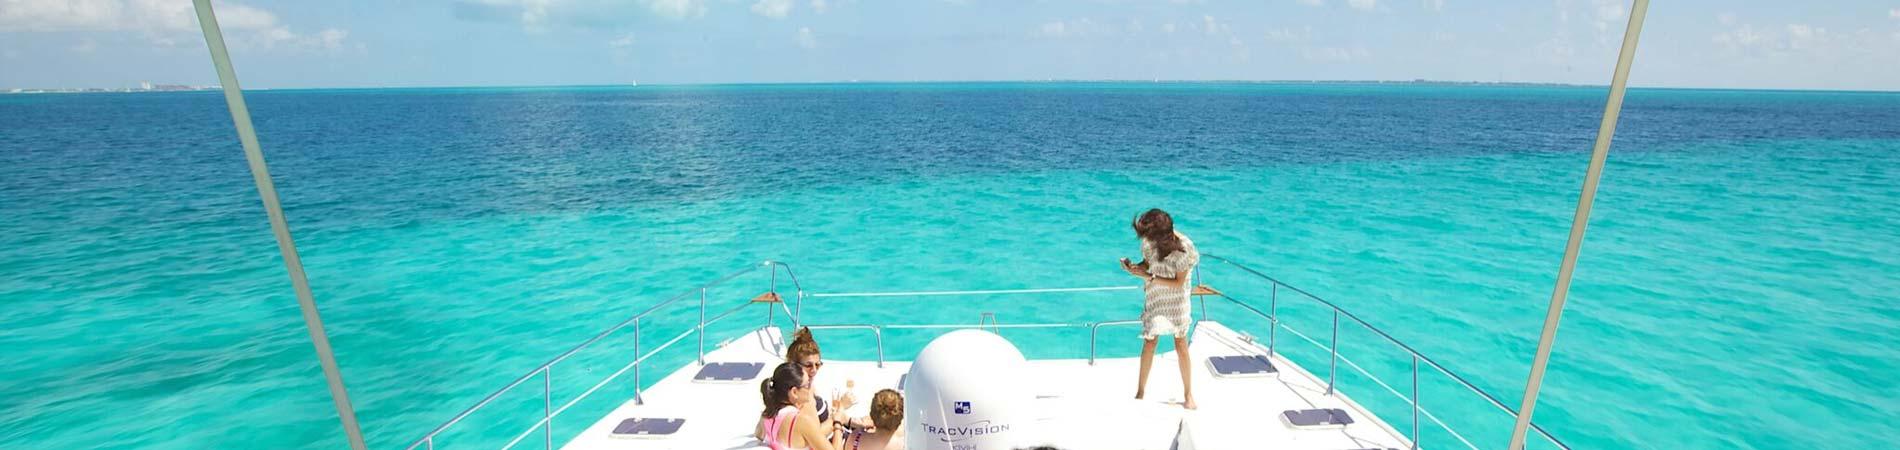 Private Catamaran To Isla Mujeres Journey Mexico